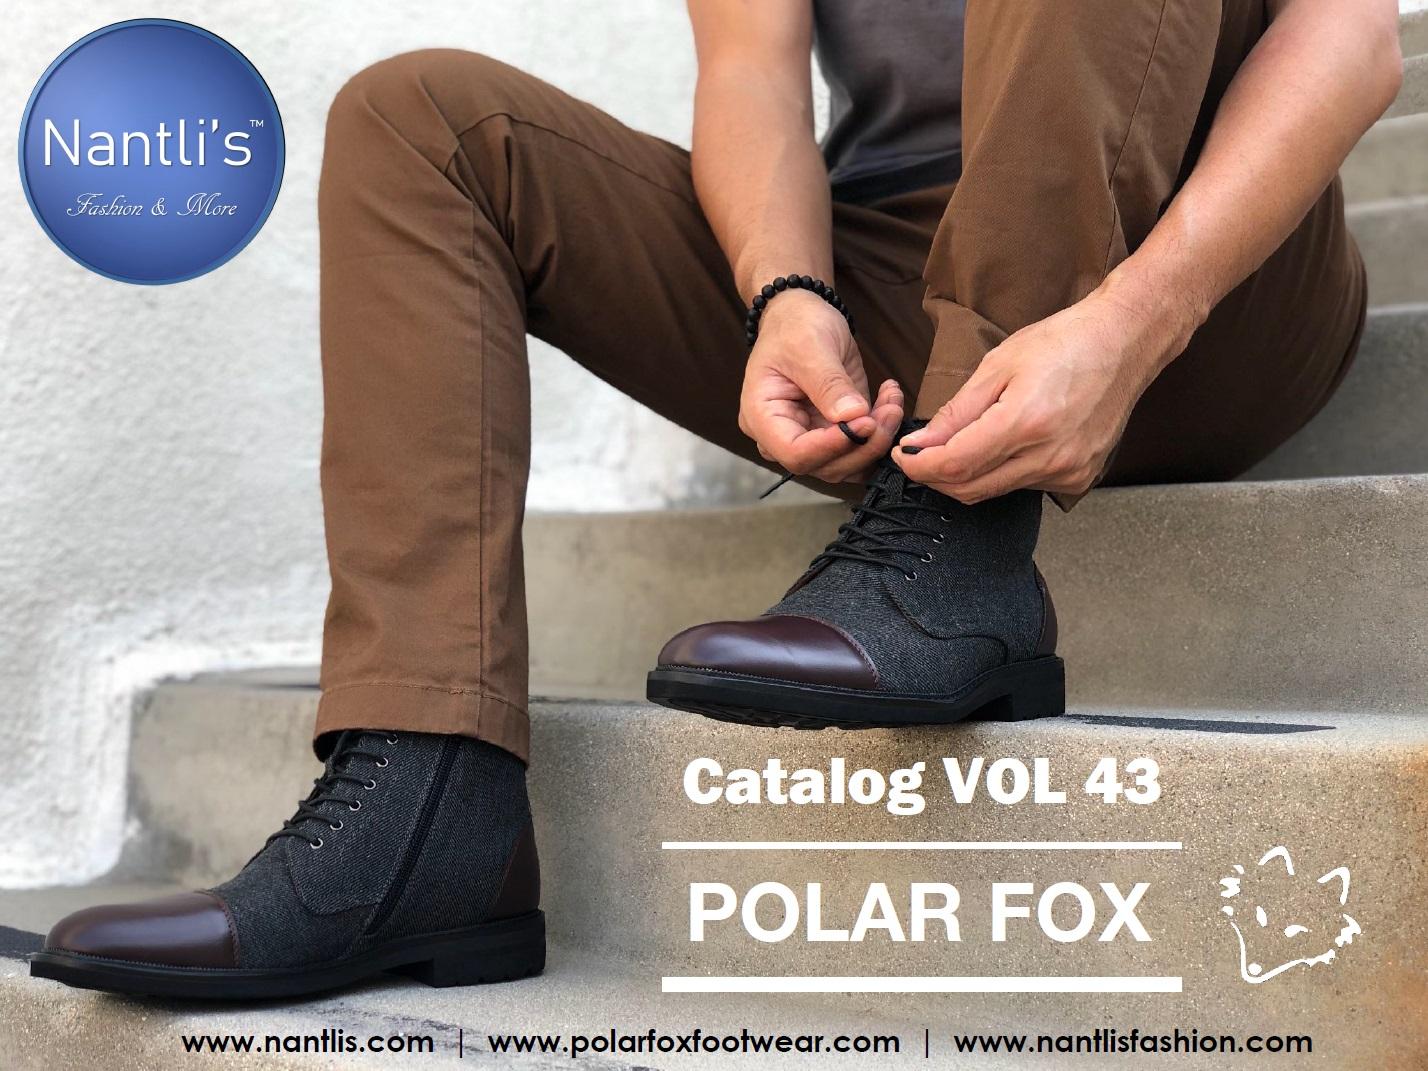 Nantlis Vol 43 Zapatos para Hombres Mayoreo Wholesale men shoes Catalogo Polar Fox Footwear_Page_01